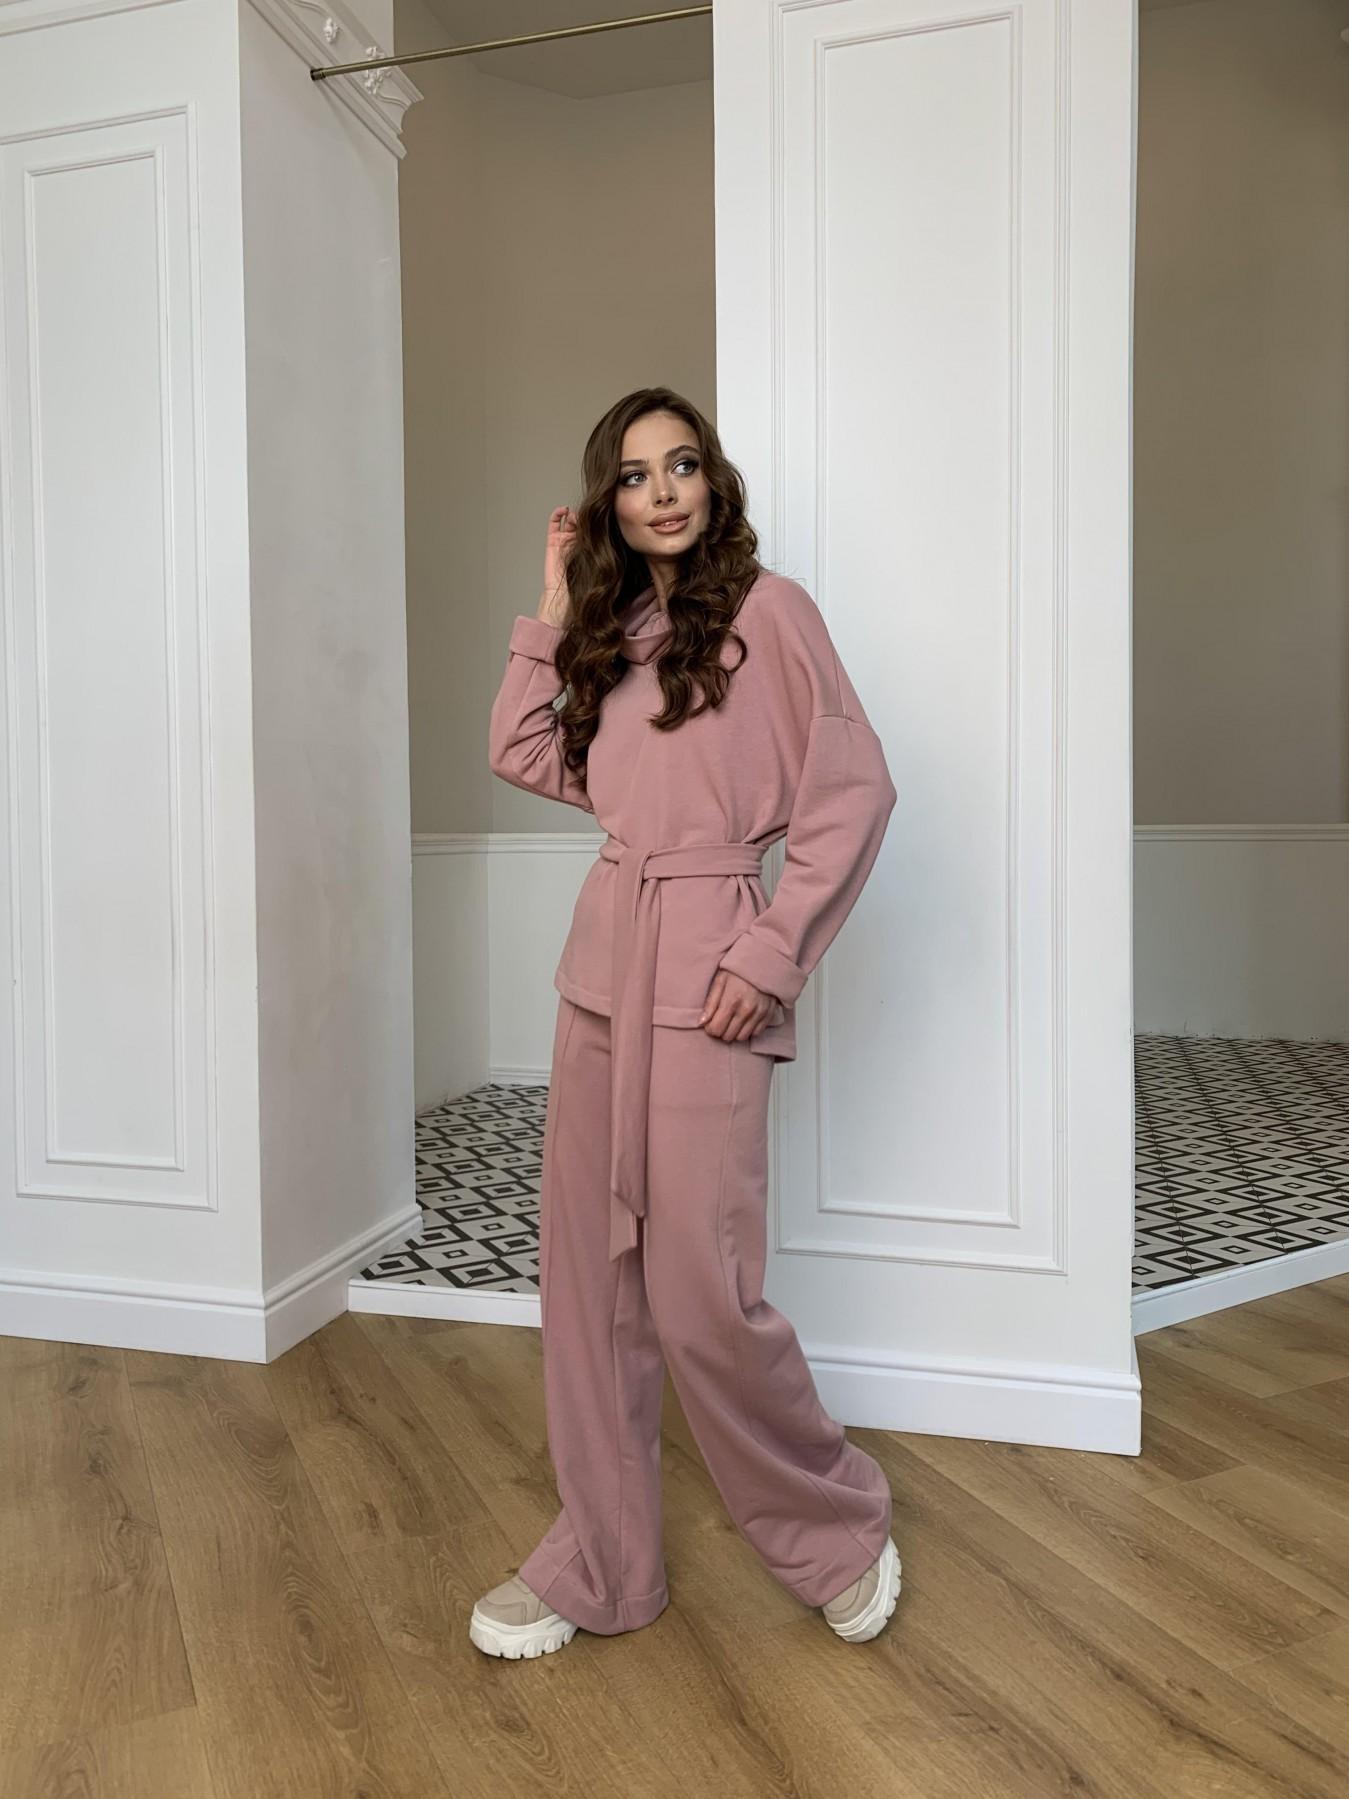 Джаст костюм Oversize  3х нитка 10564 АРТ. 47244 Цвет: Пудра - фото 7, интернет магазин tm-modus.ru